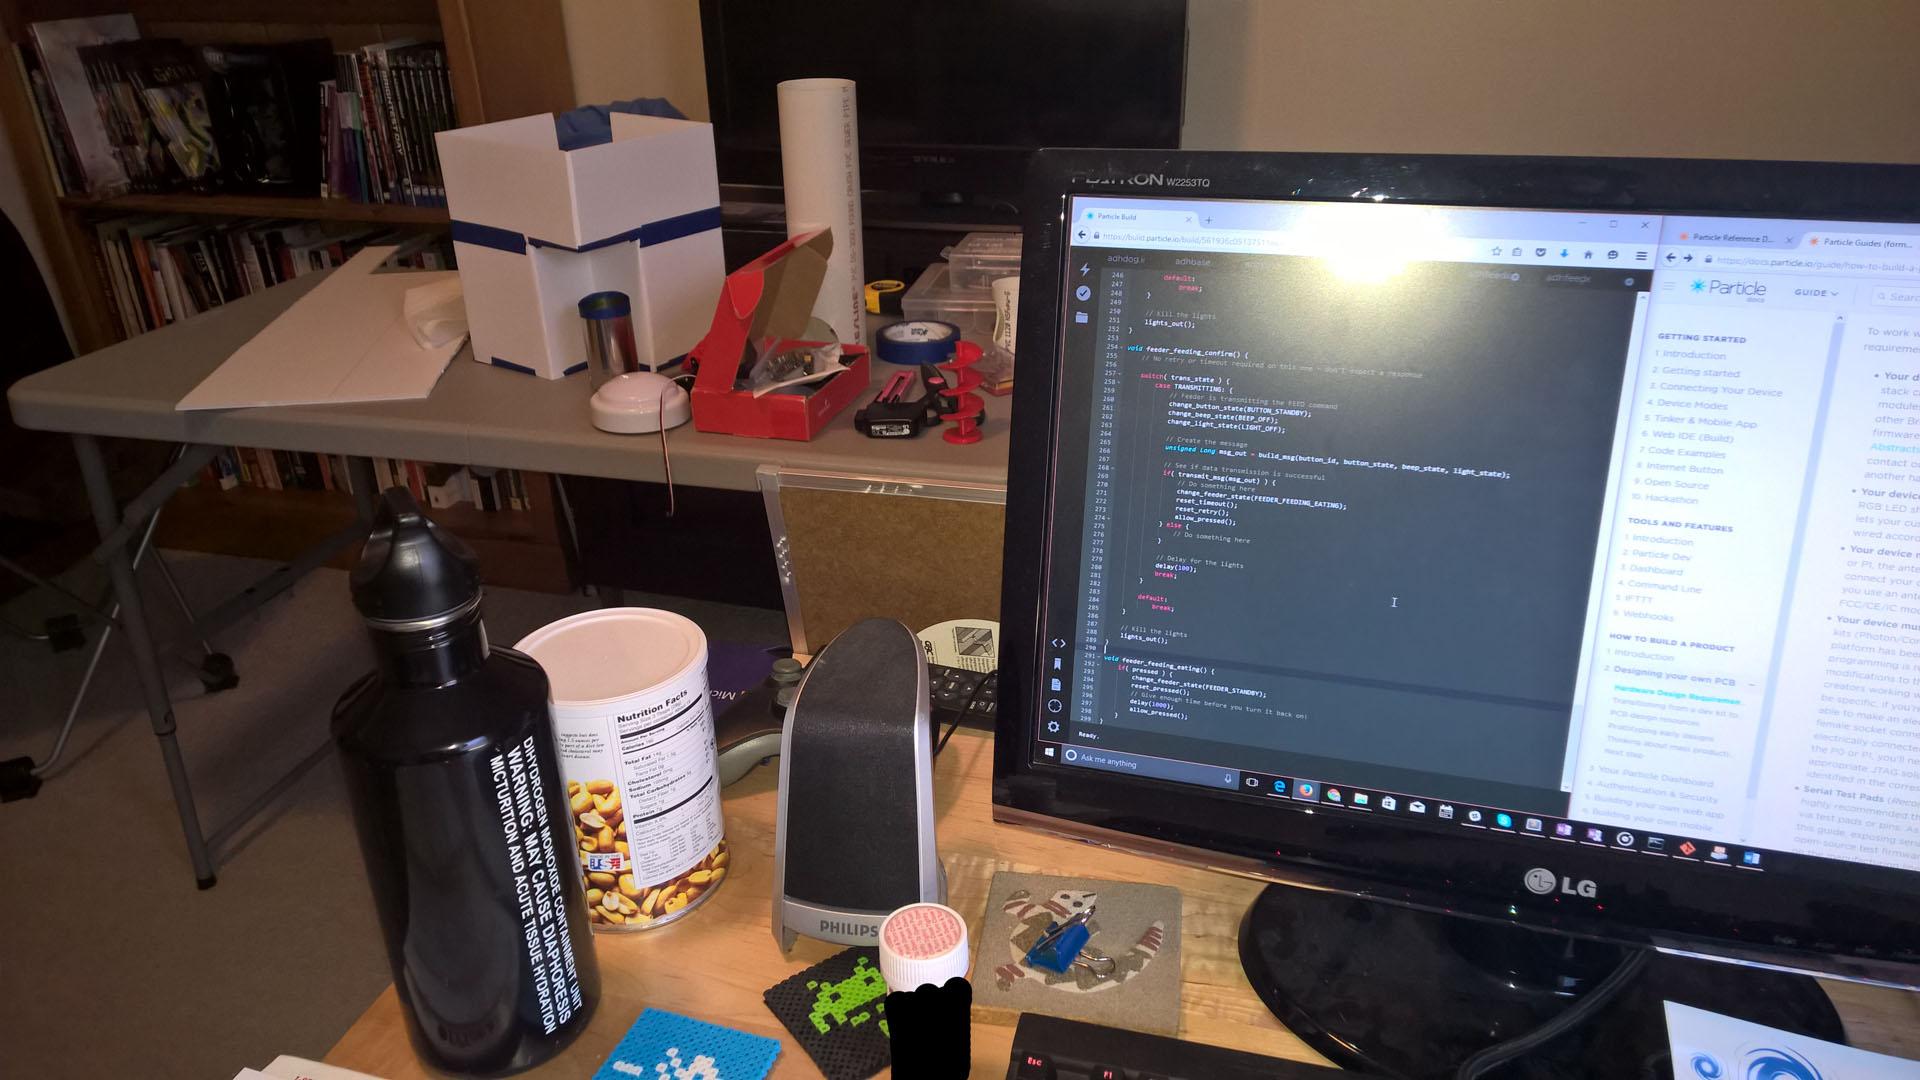 Prototype v2.0-alpha 3